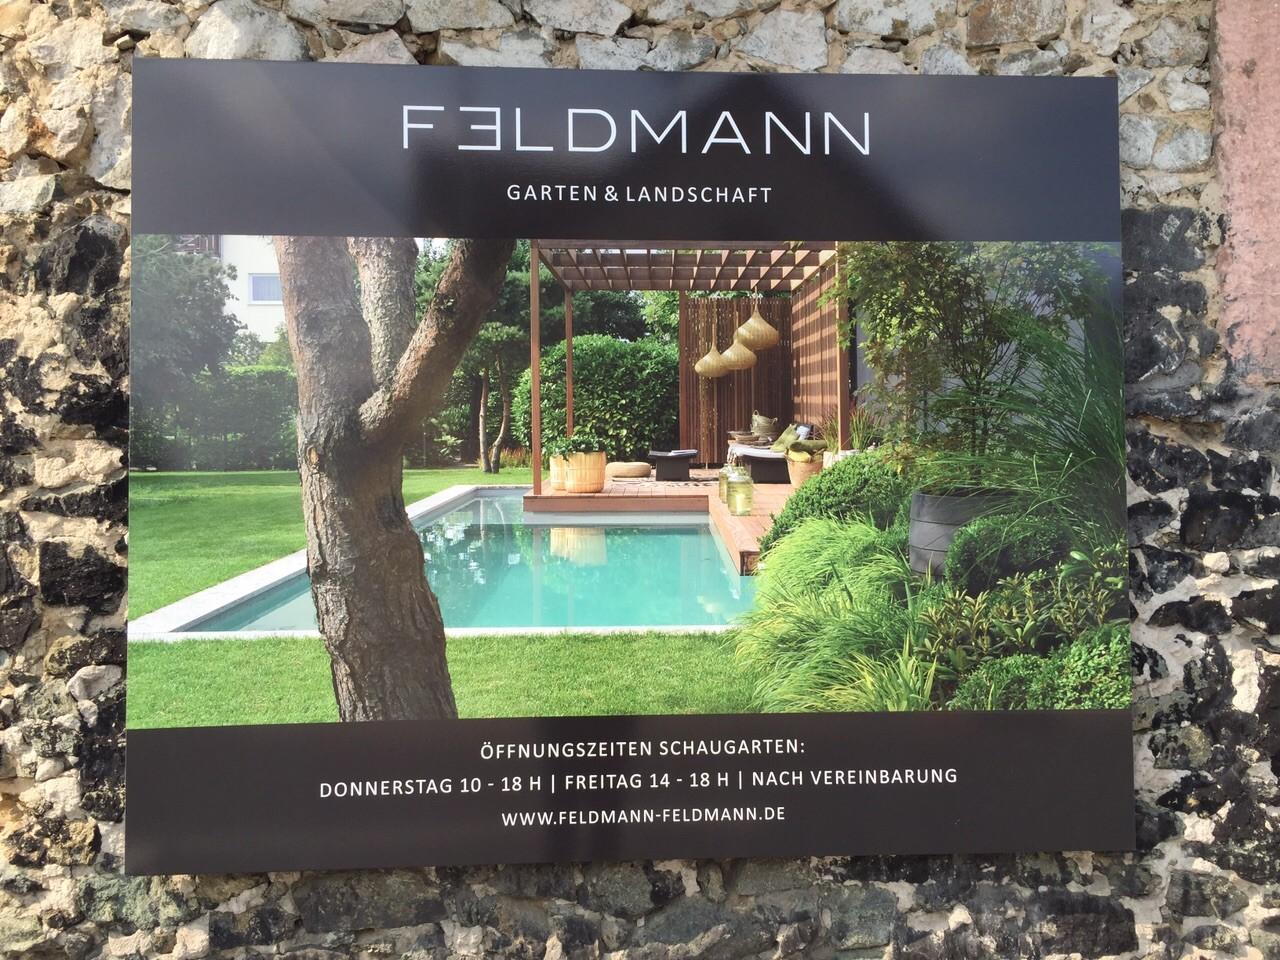 Feldmann Gartenbau feldmann pfungstadt feldmann kbv pagmaybaum kongress bild u